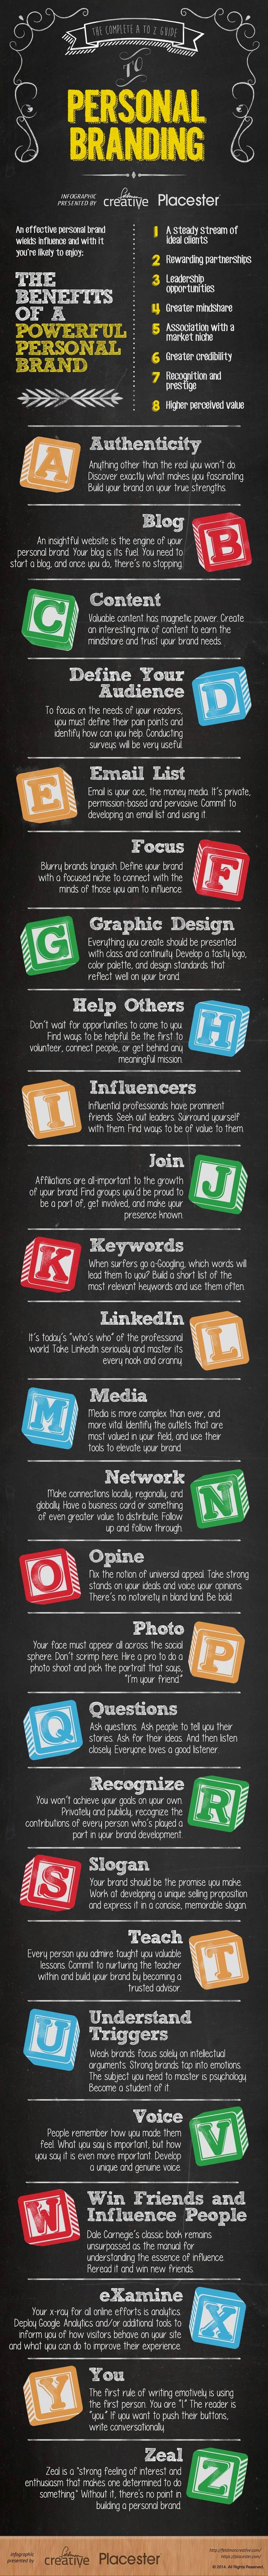 personal-branding-guide